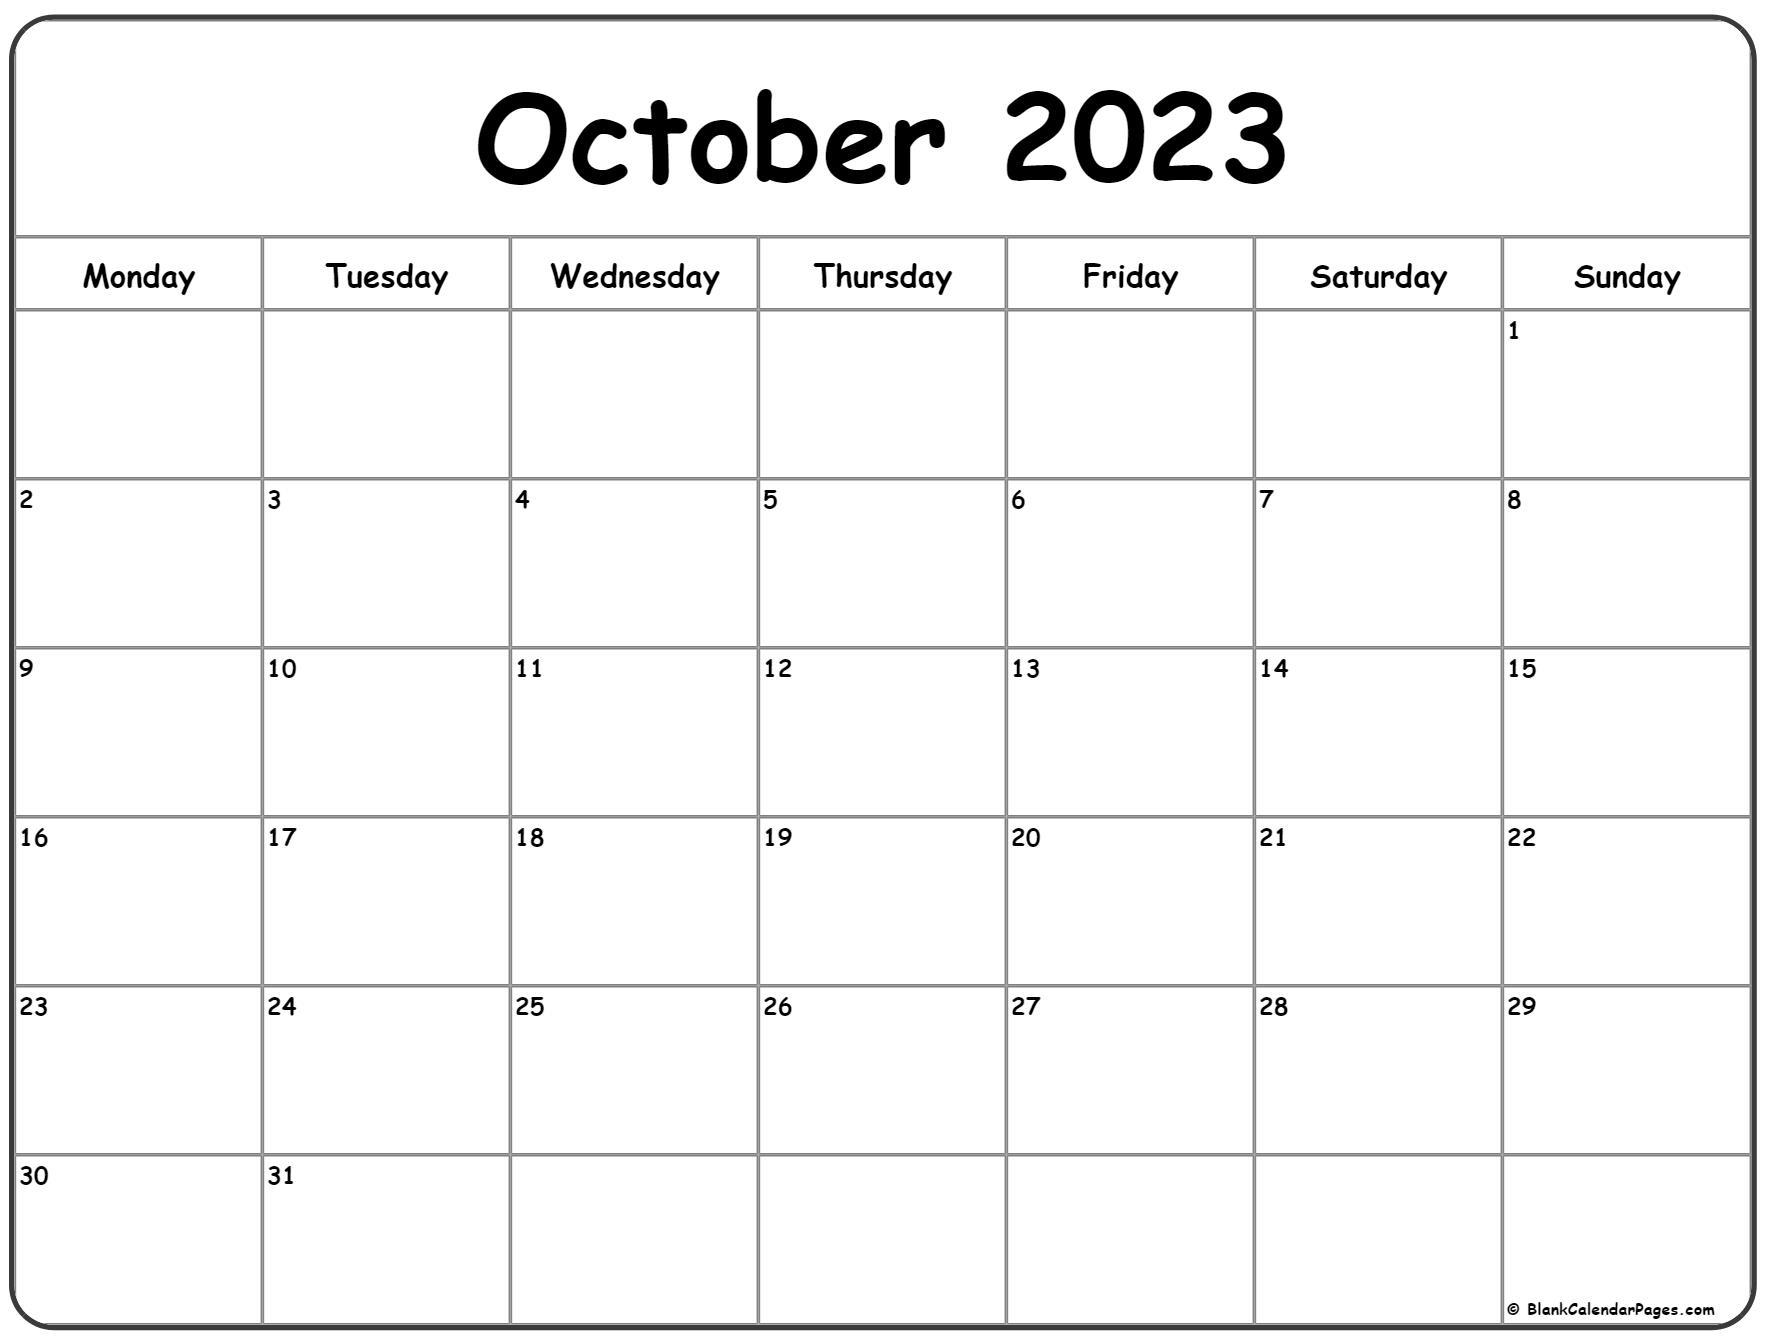 October 2023 Monday calendar. Monday to Sunday